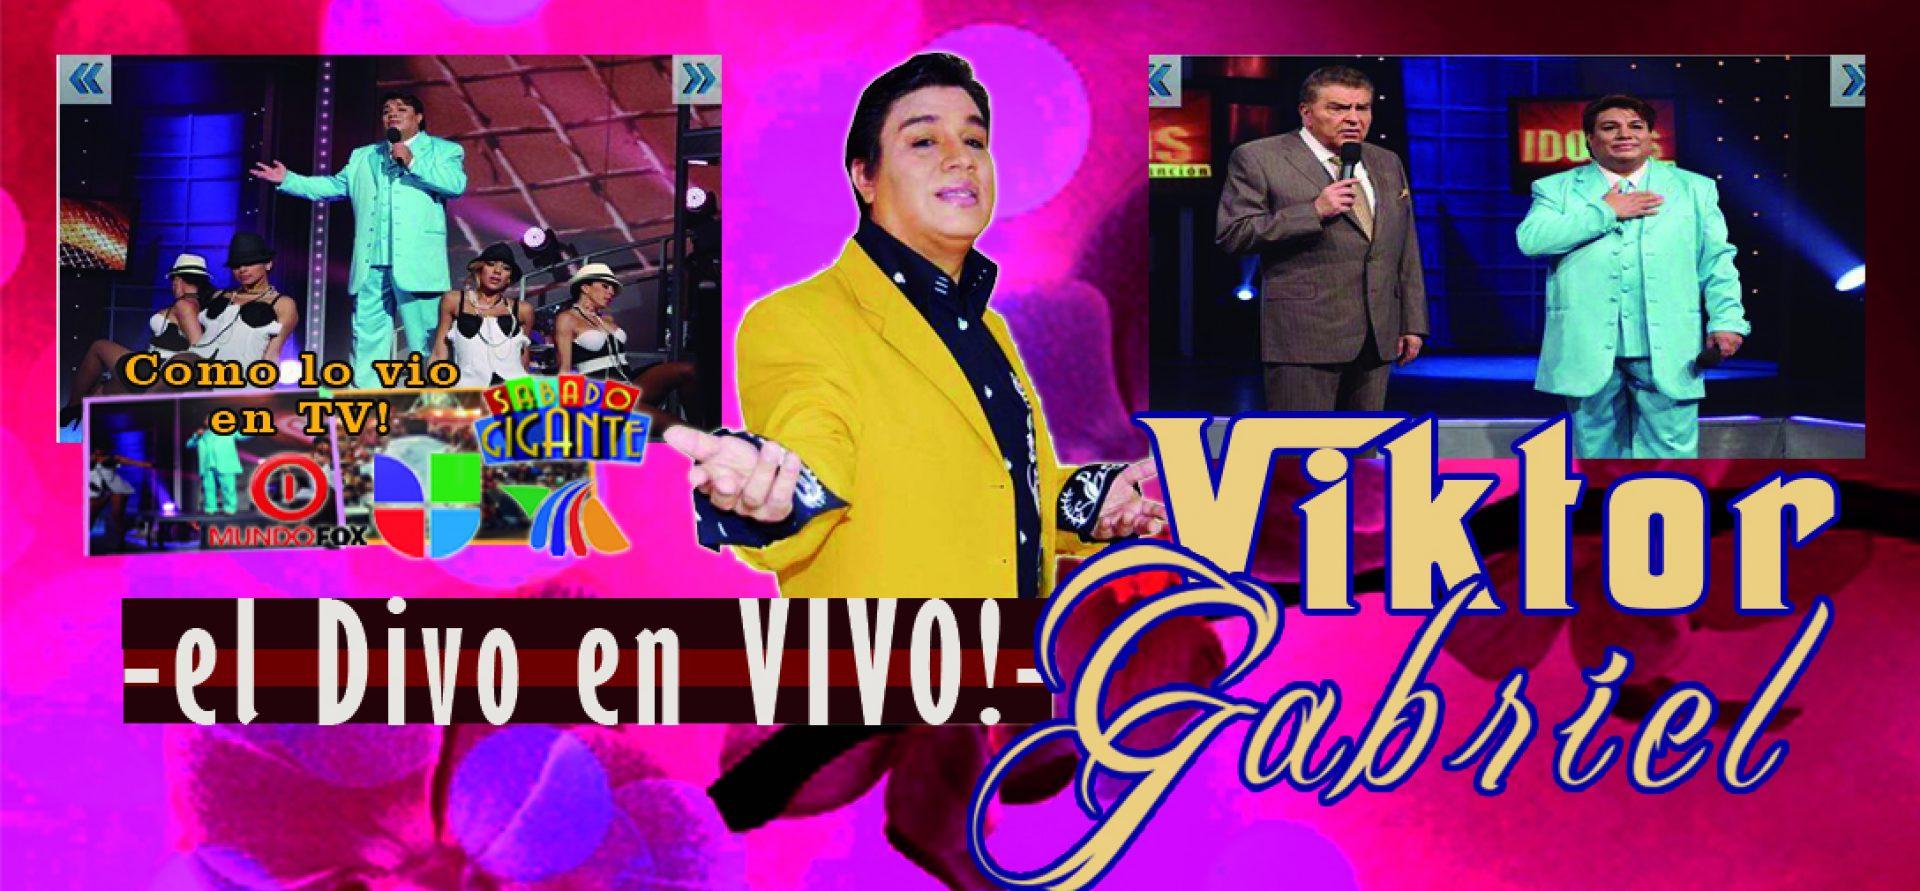 Pagina Oficial de Viktor Gabriel